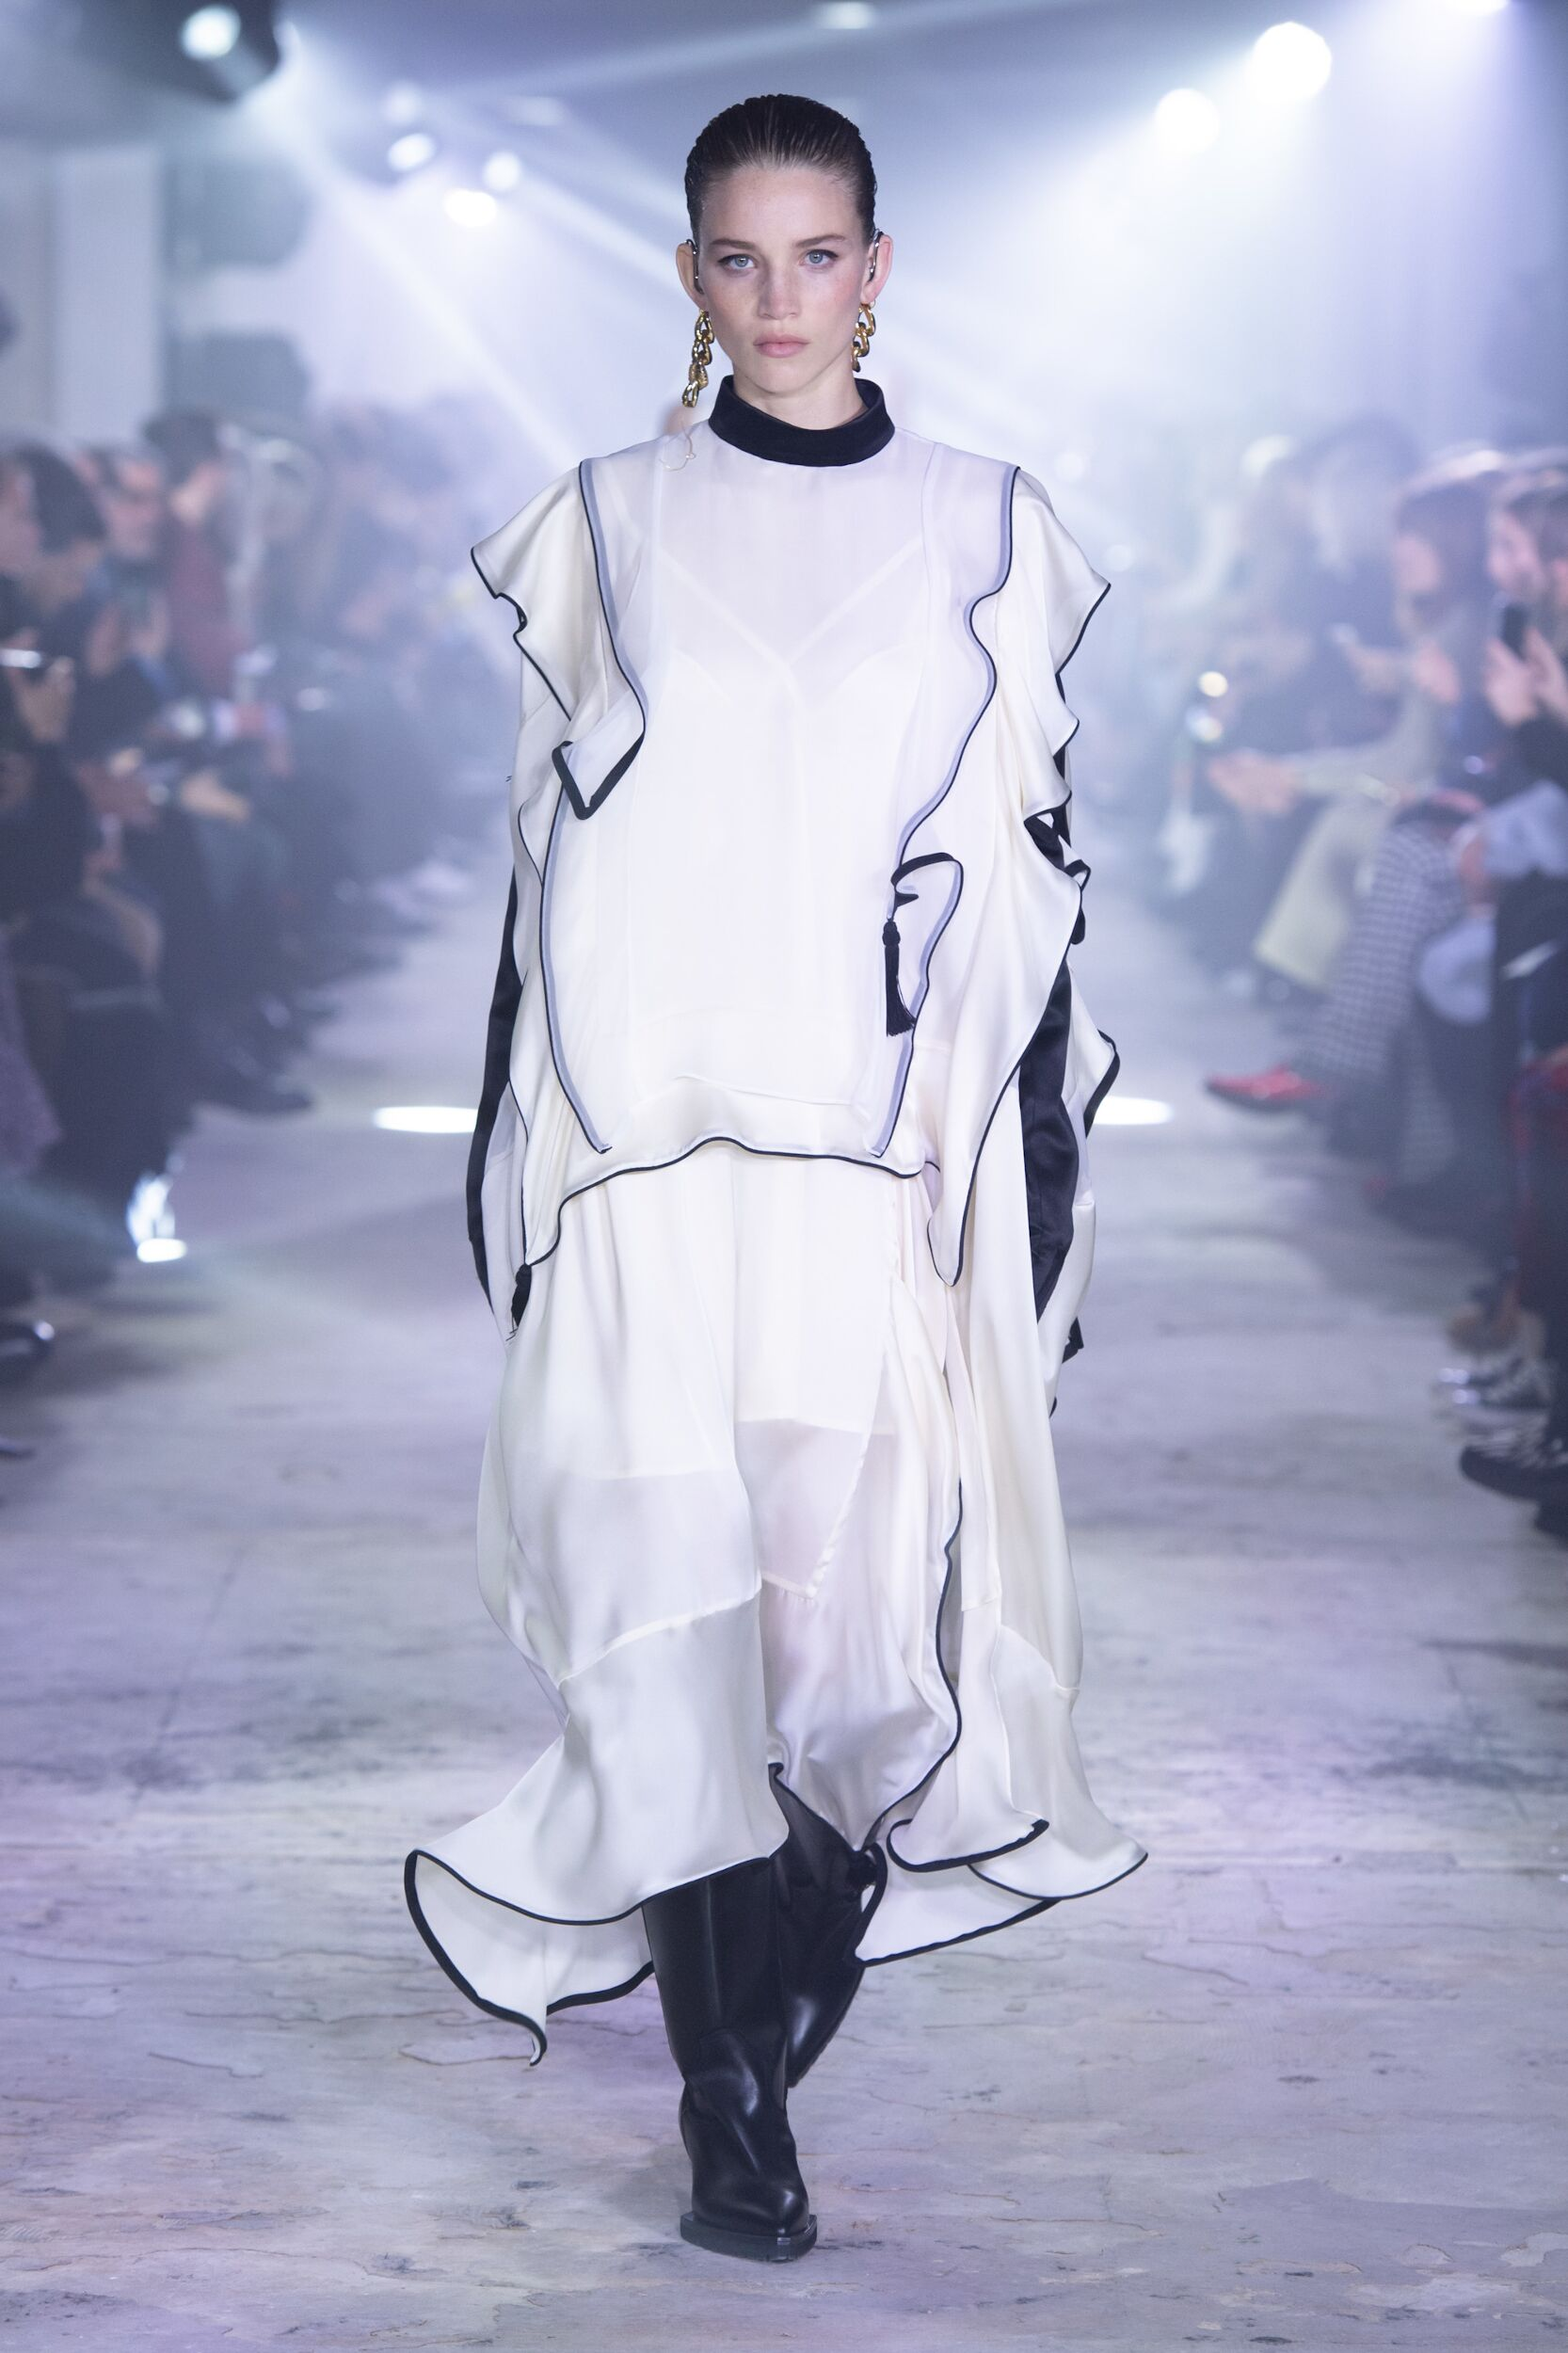 Catwalk Sacai Woman Fashion Show Winter 2020